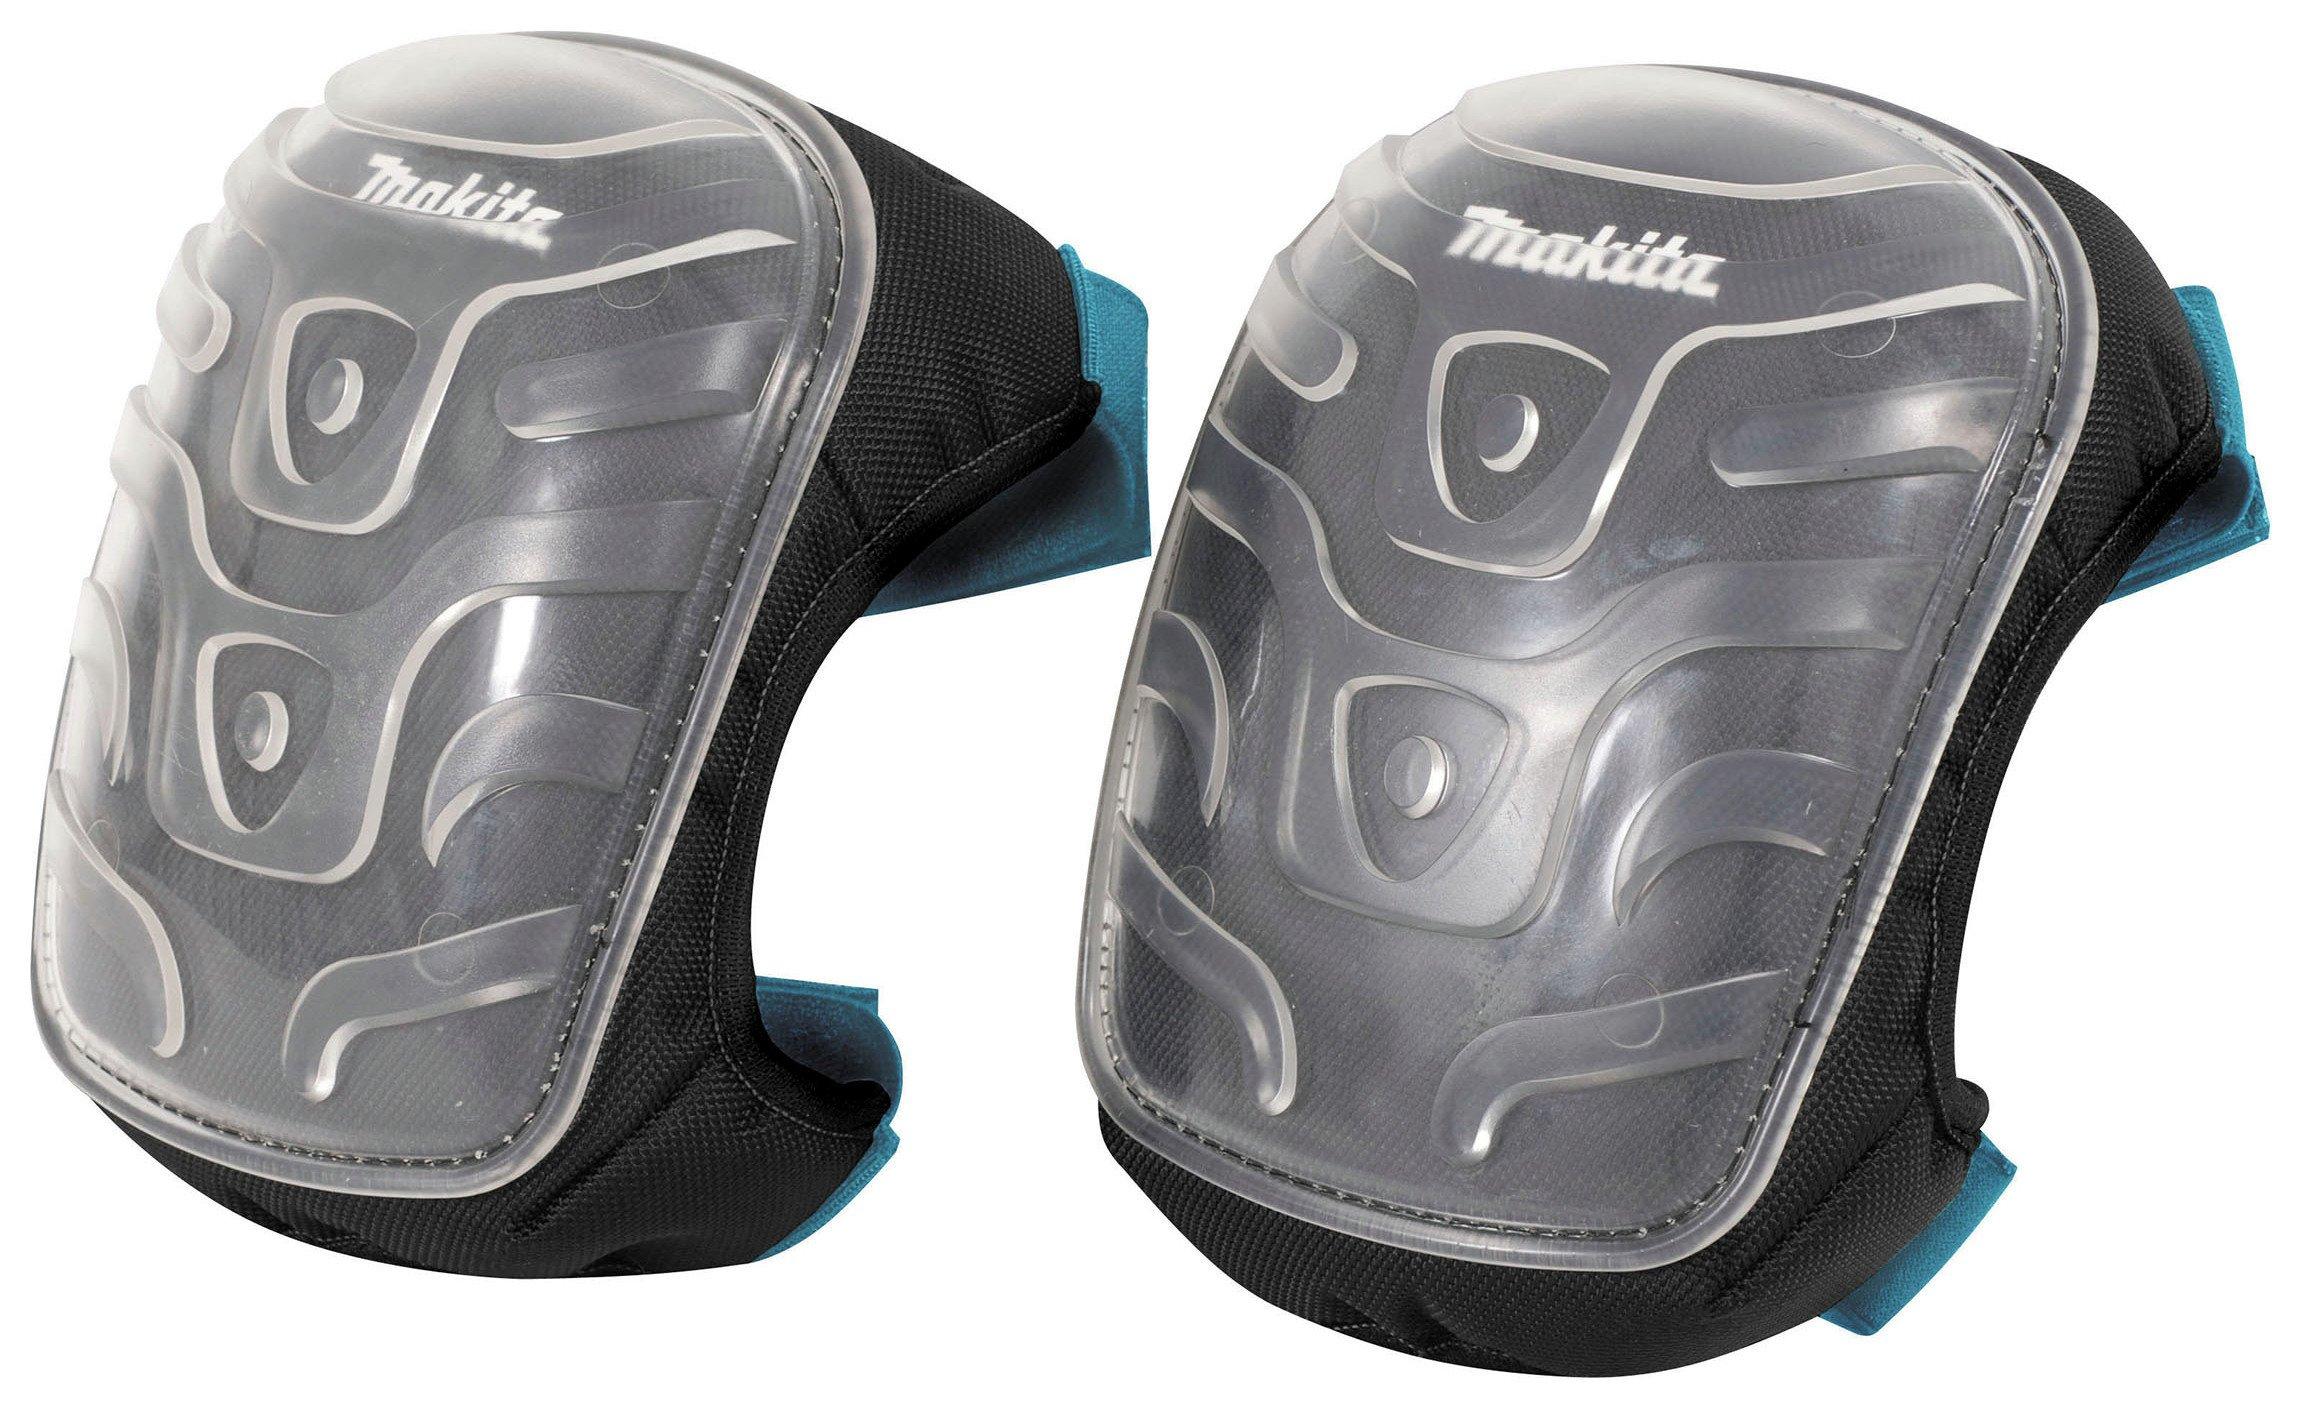 Makita Heavy Duty Gel Knee Pads